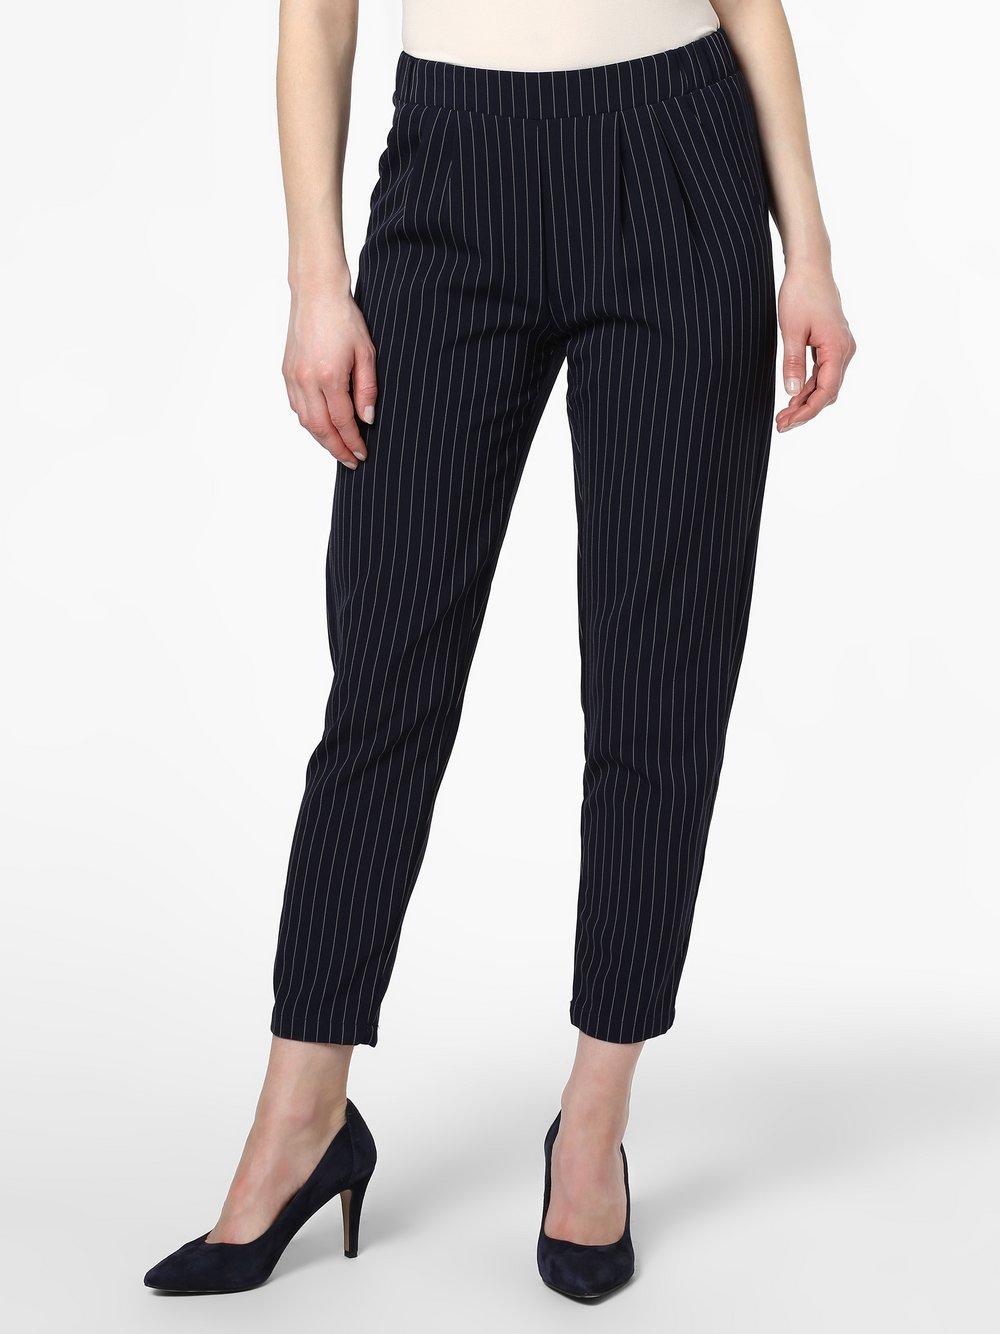 Minimum – Spodnie damskie – Sofja, niebieski Van Graaf 464879-0001-00360